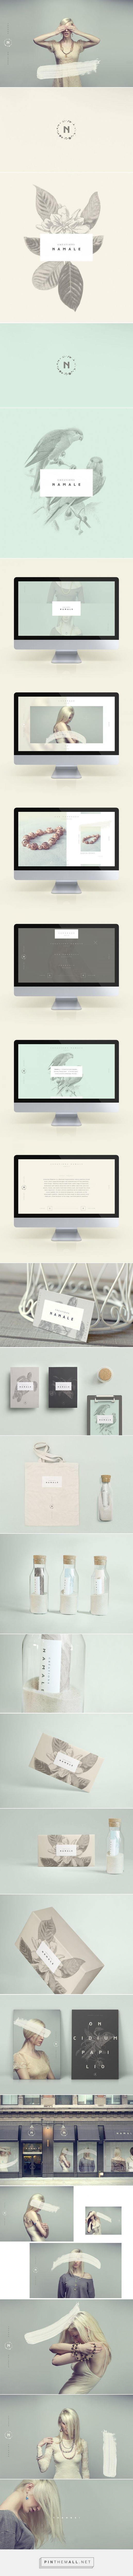 Créations Namale Branding by Phoenix the Creative Studio on Behance | Fivestar Branding – Design and Branding Agency & Inspiration Gallery